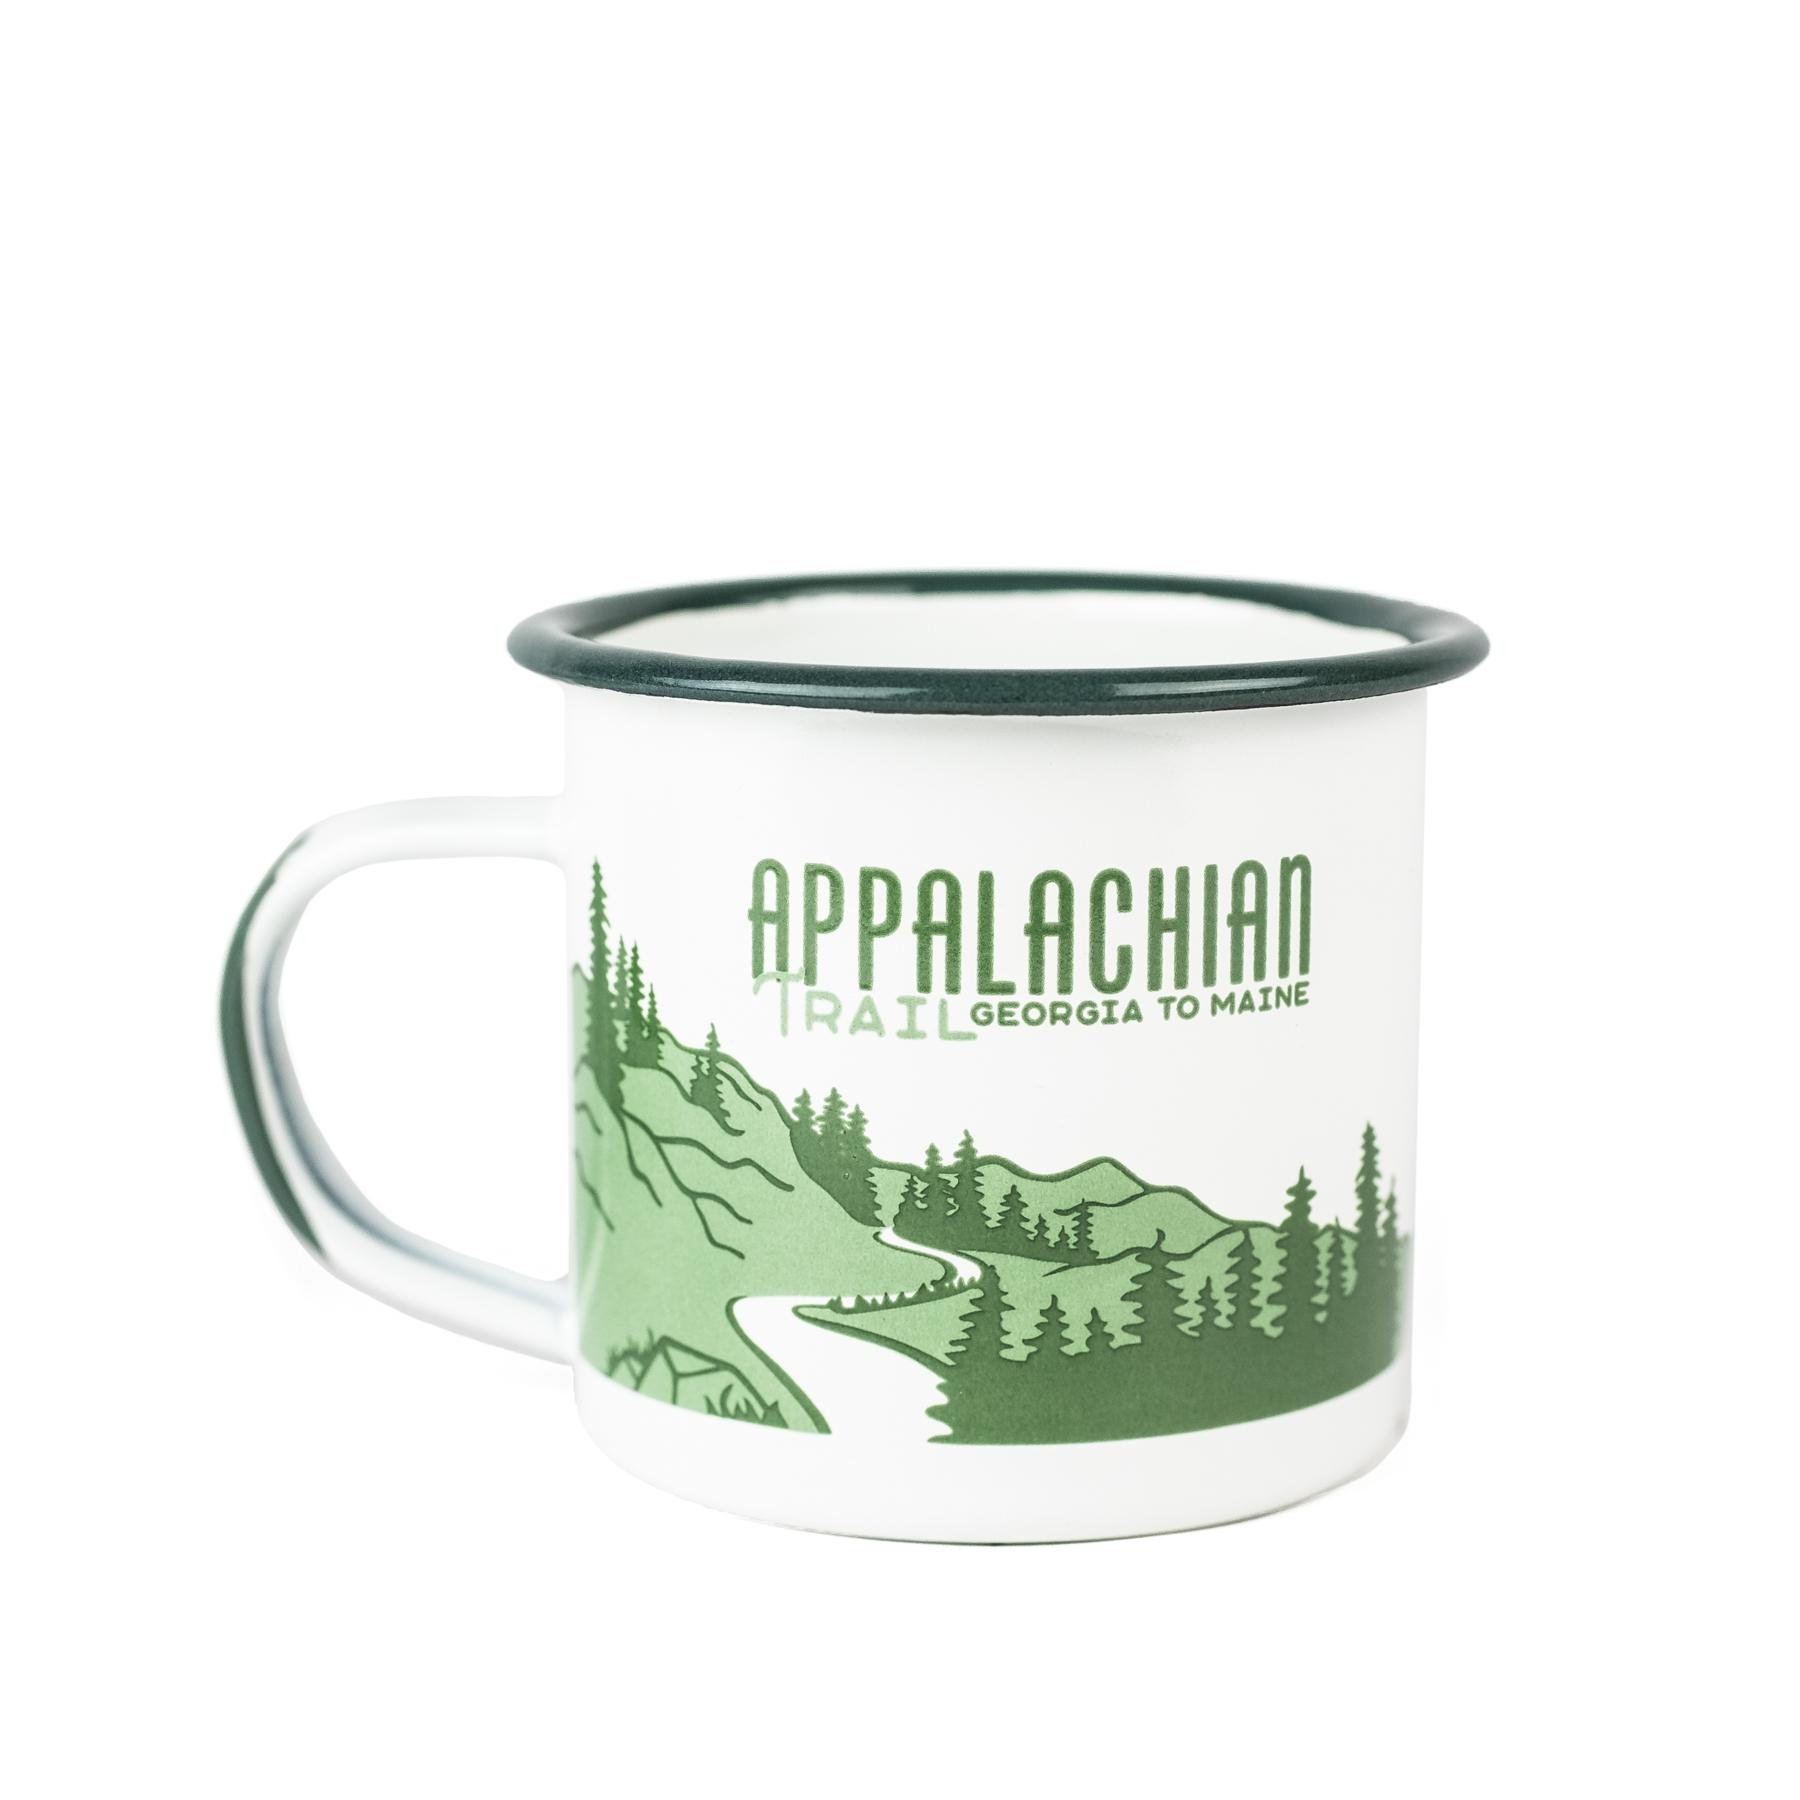 appalachian-trail-mug-3.jpg